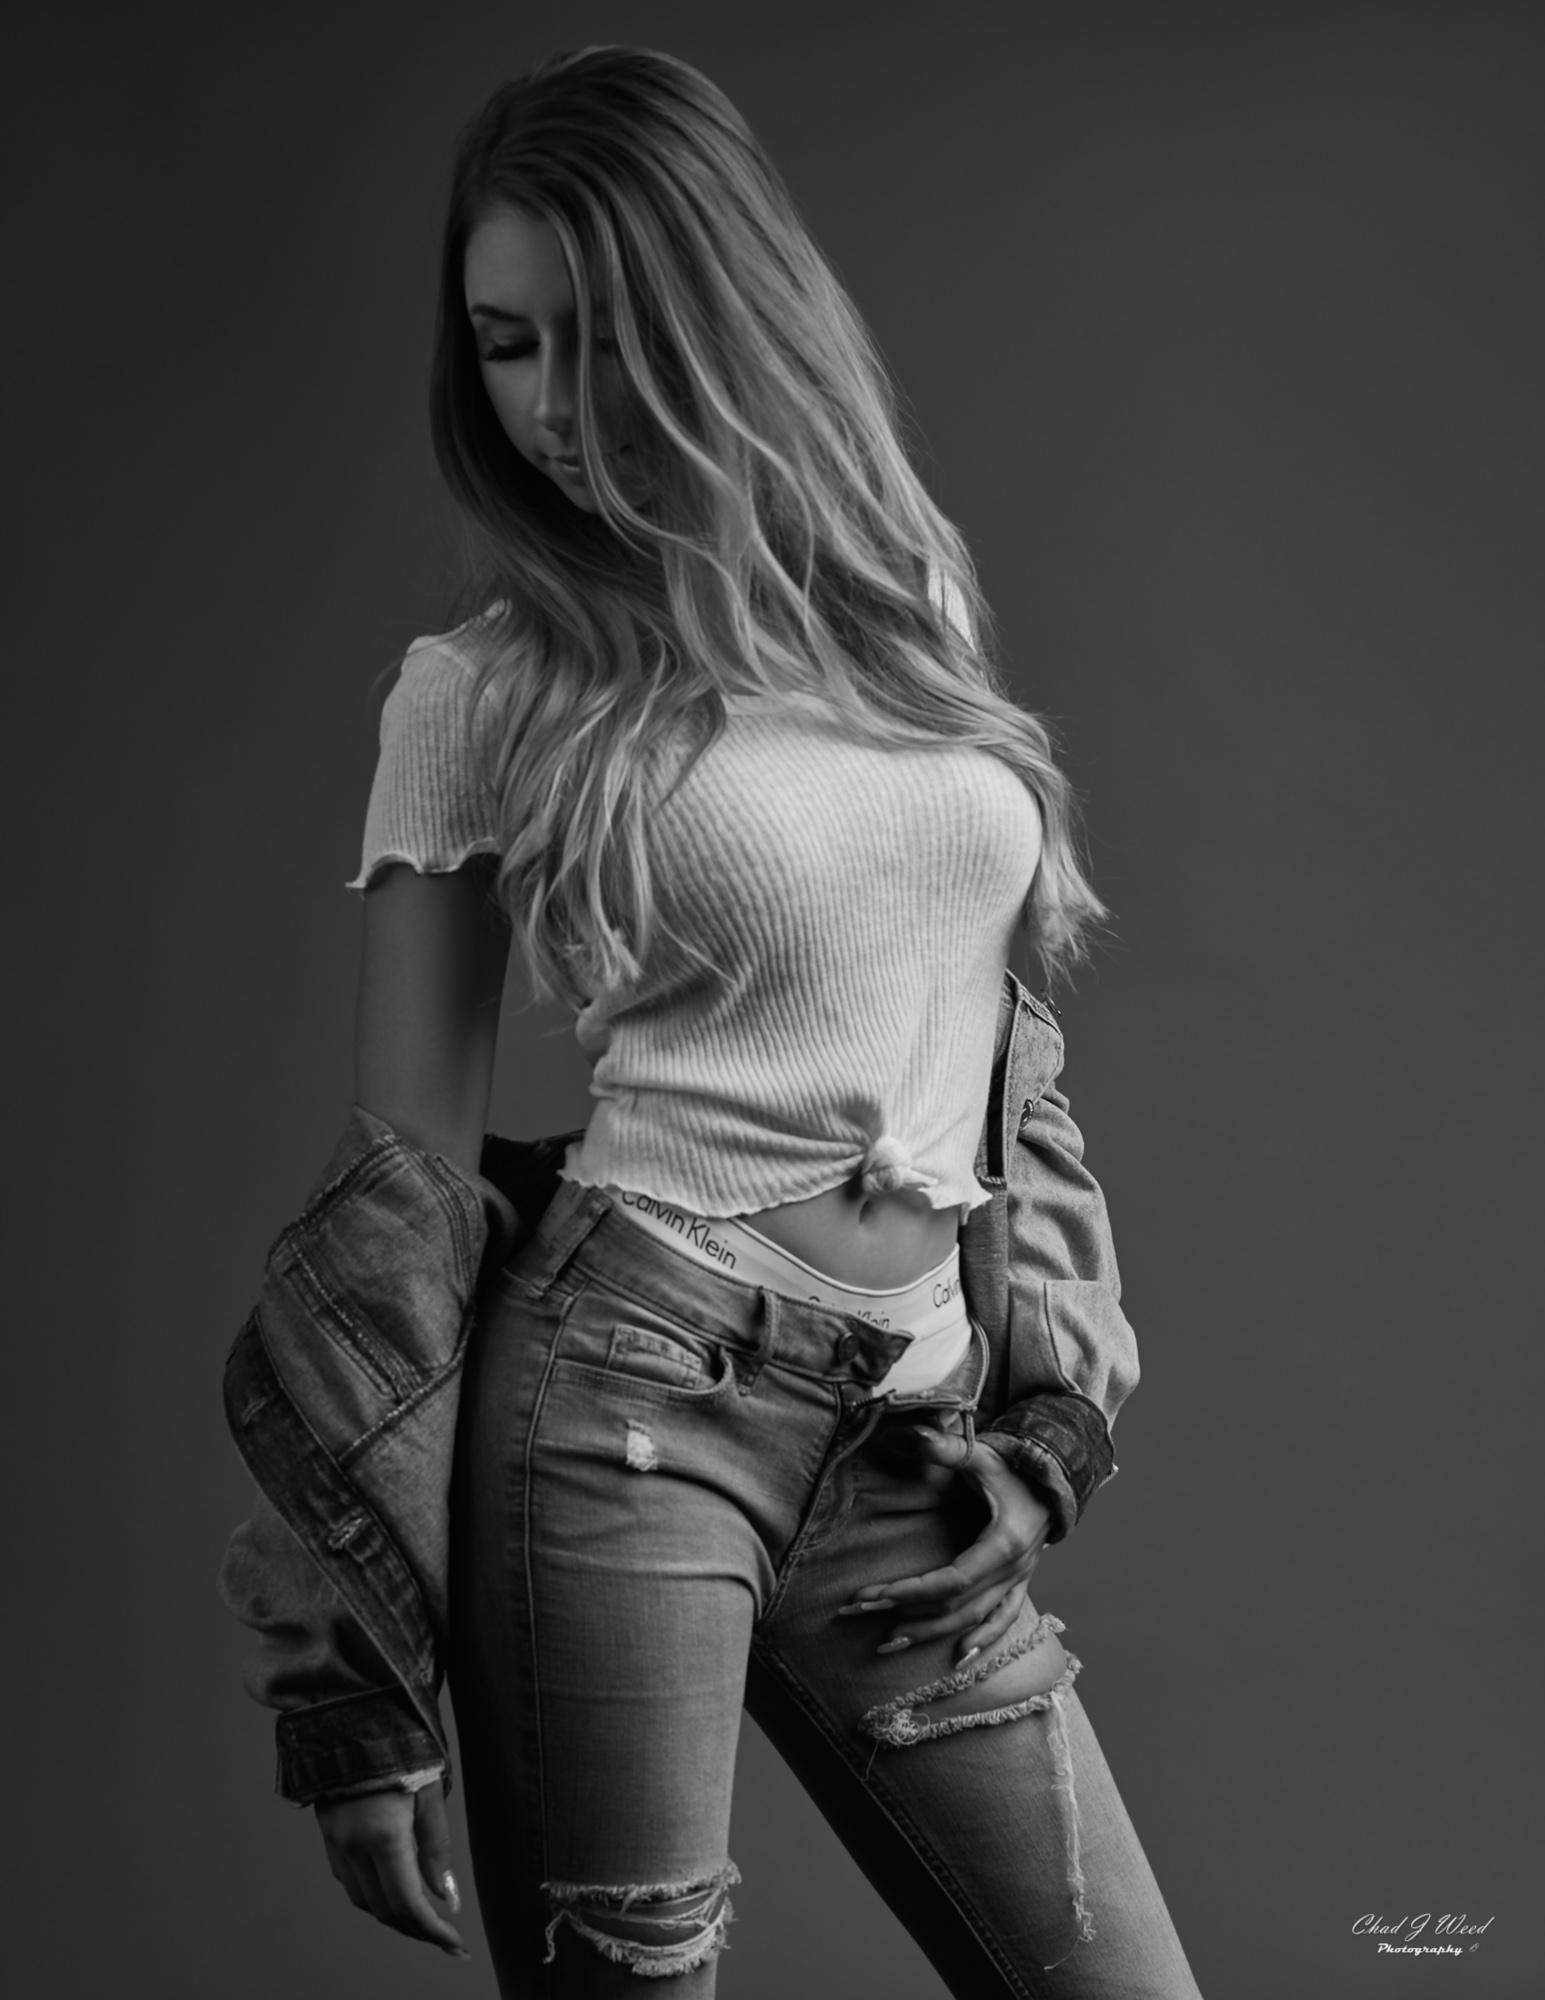 Model Mariola by Arizona Fashion Photographer Chad Weed